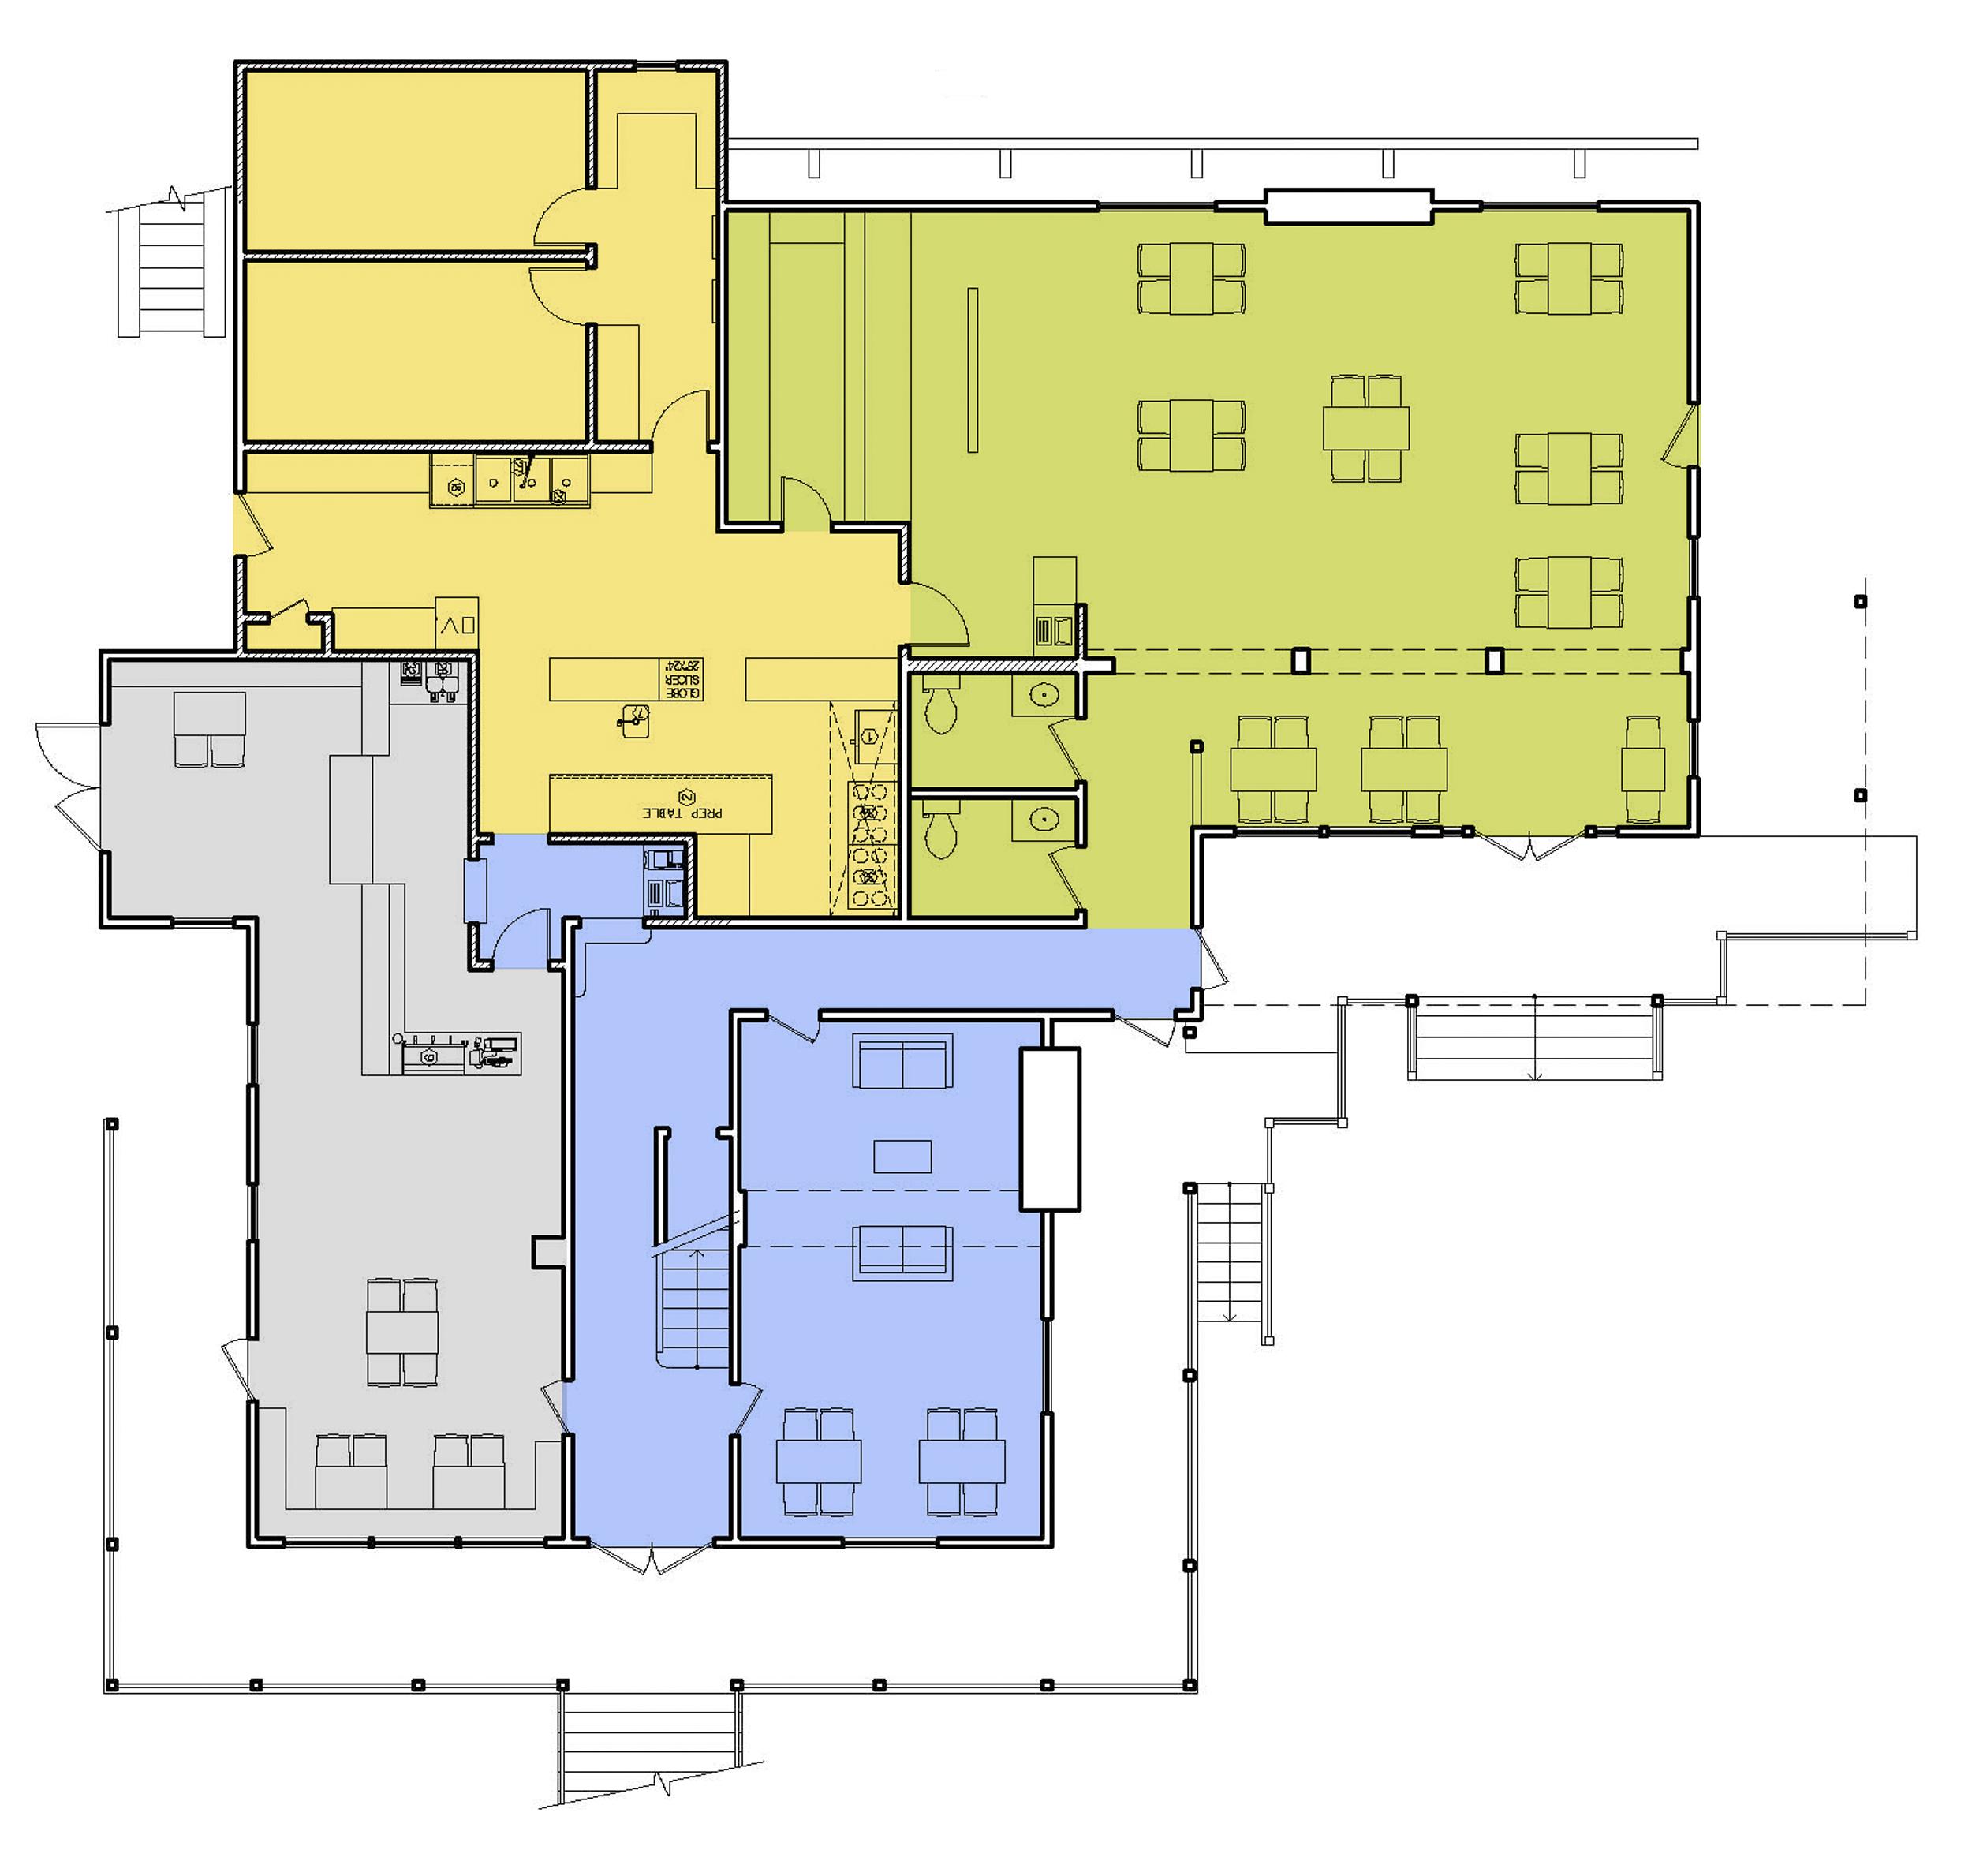 orcas first floor plan COLOR.jpg